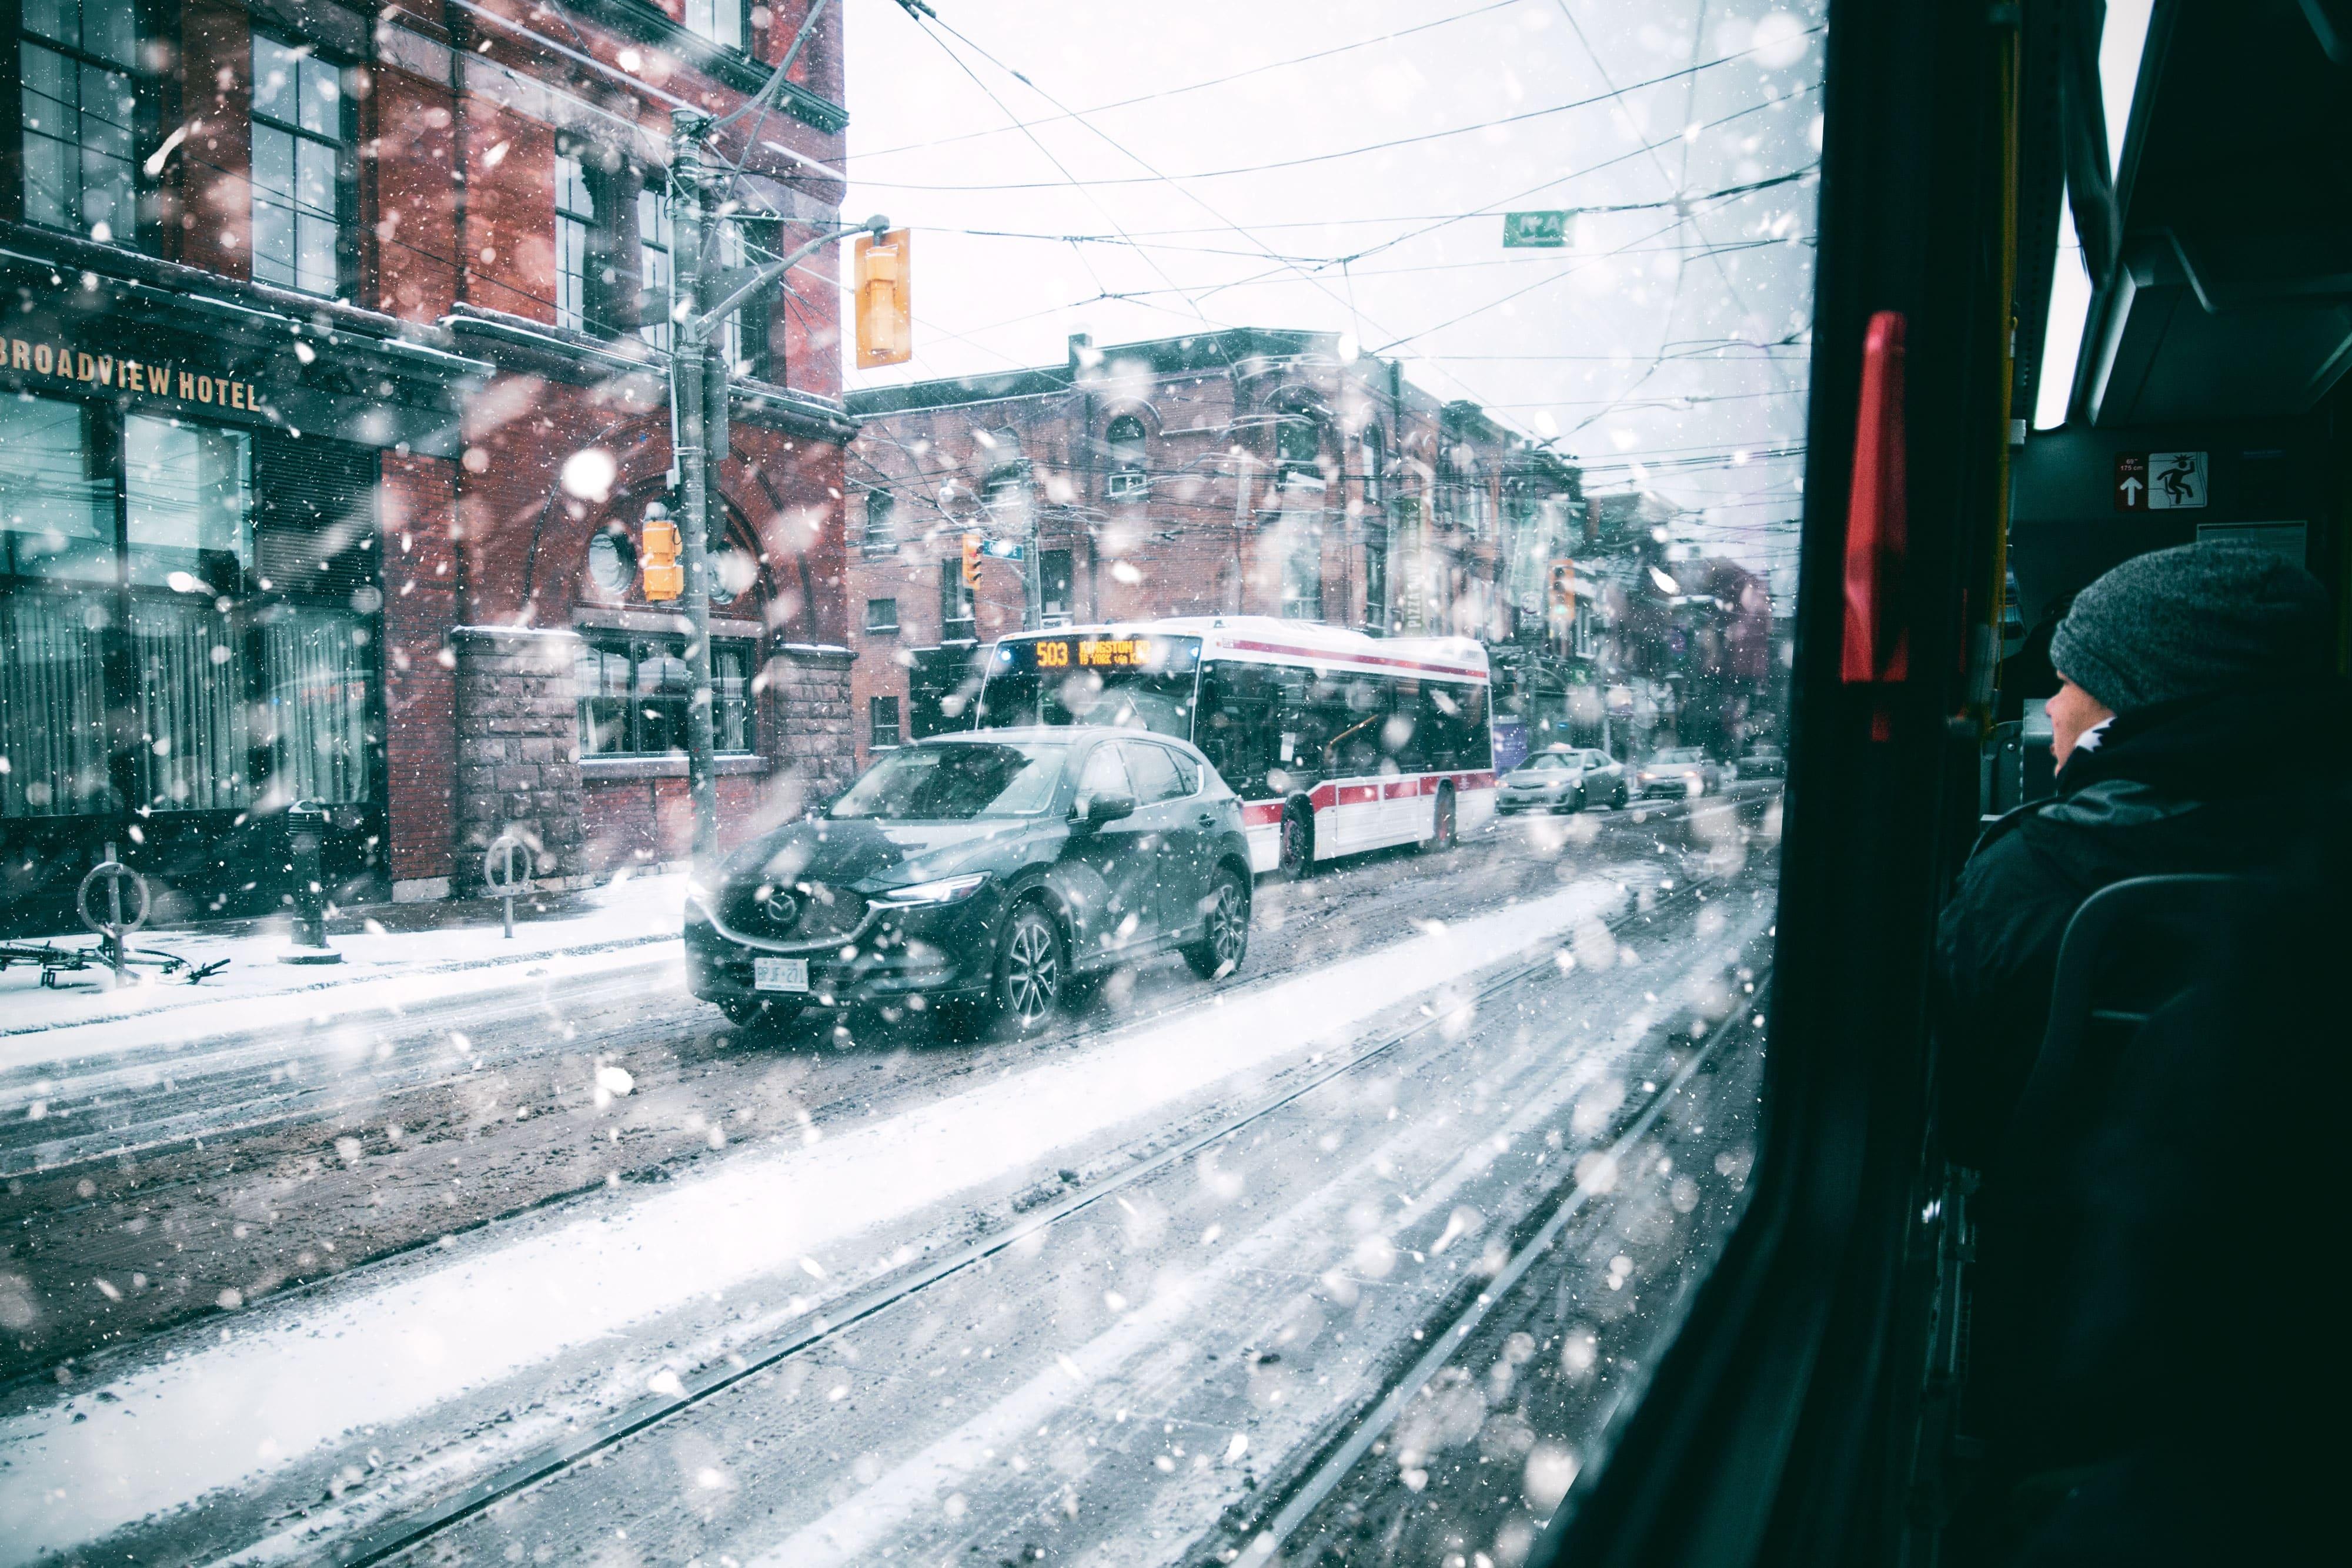 TTC in the winter